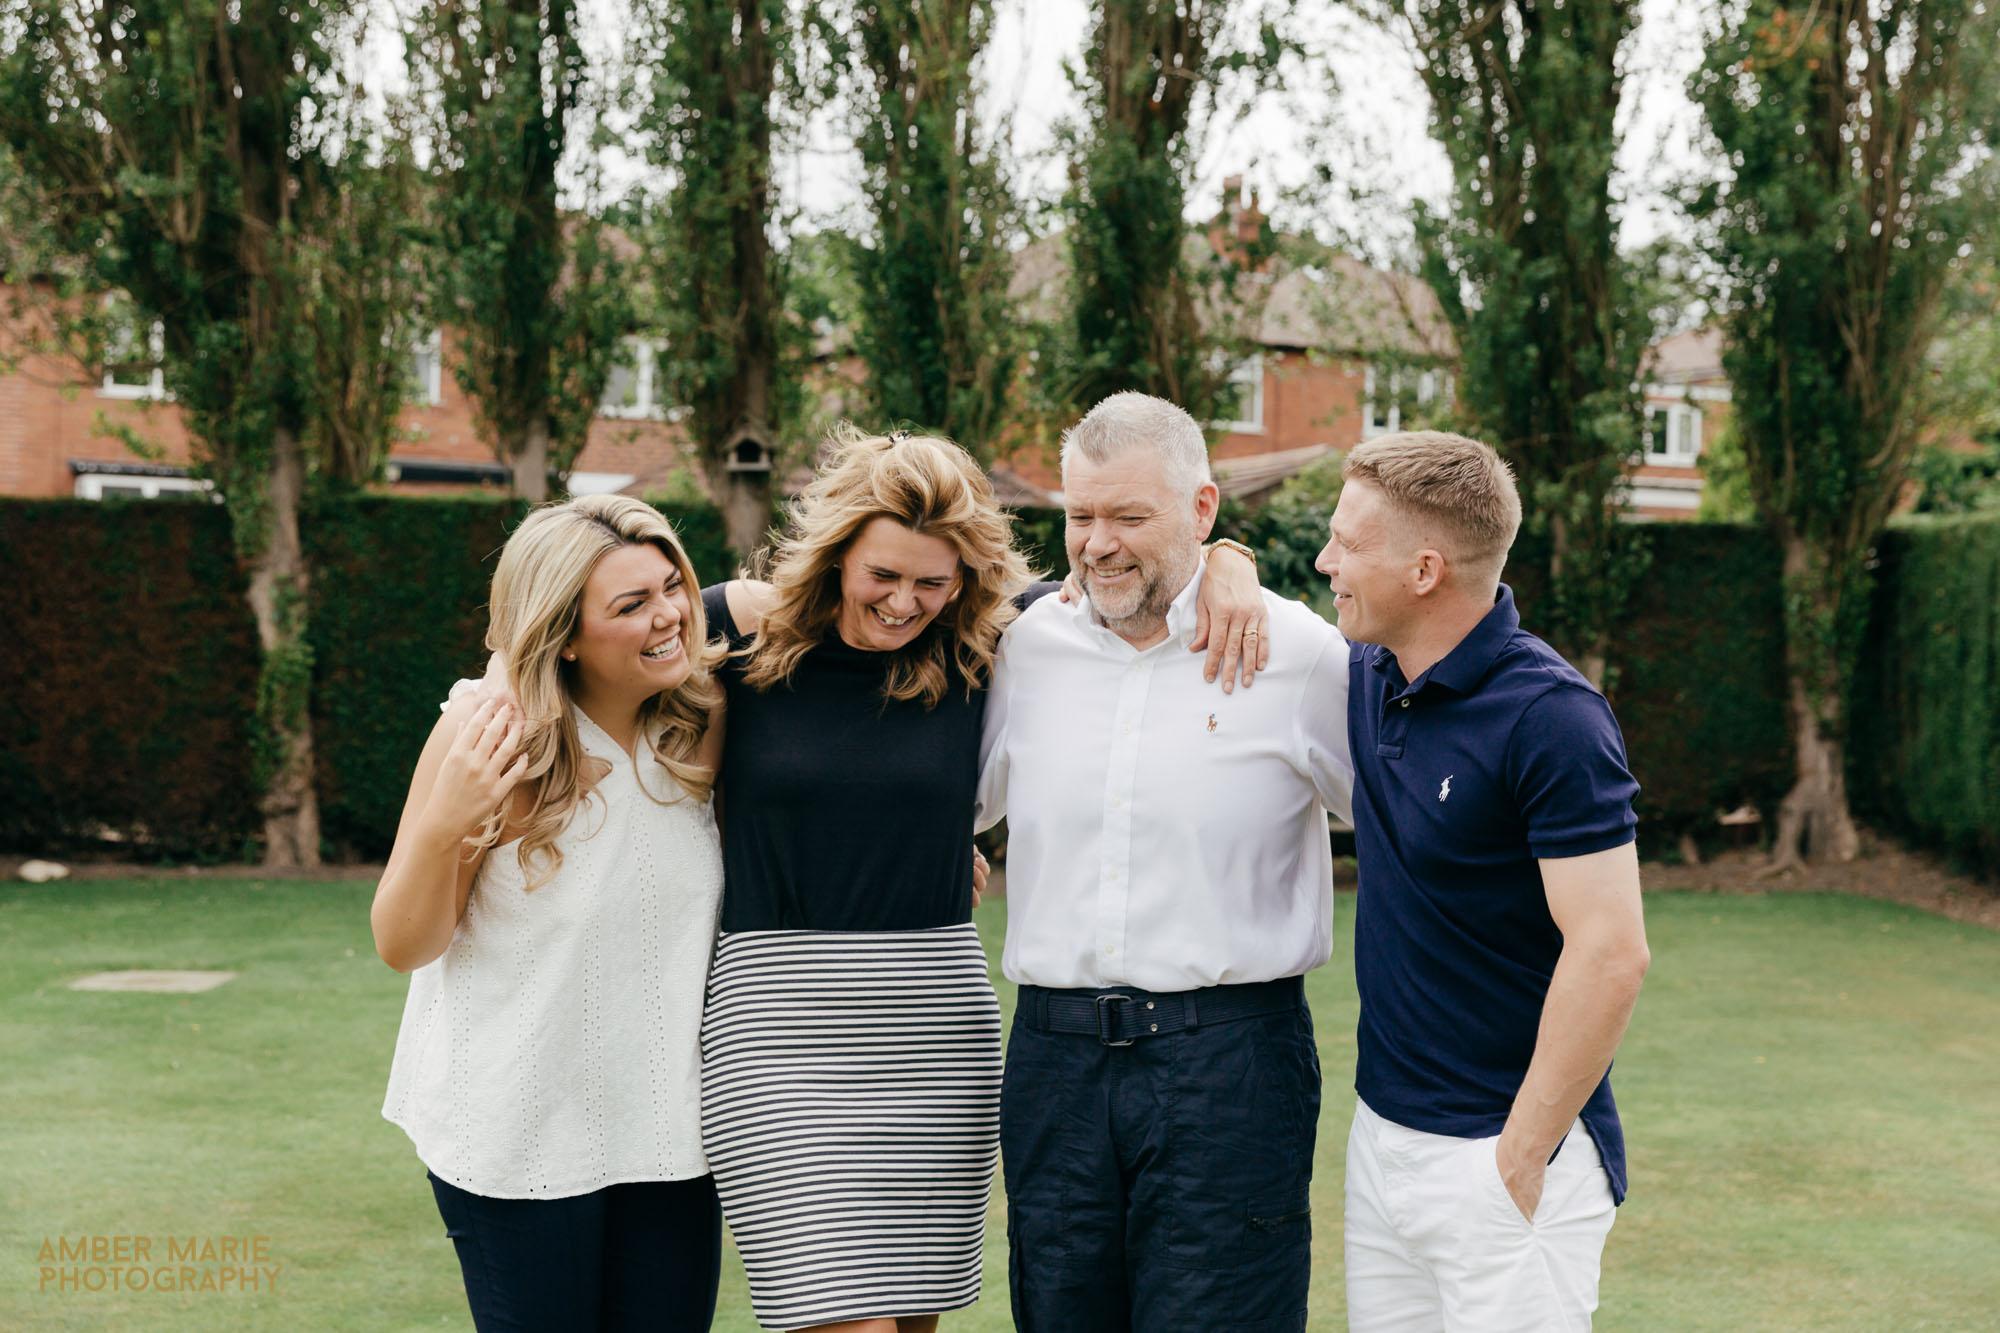 Family portrait photographer gloucestershire